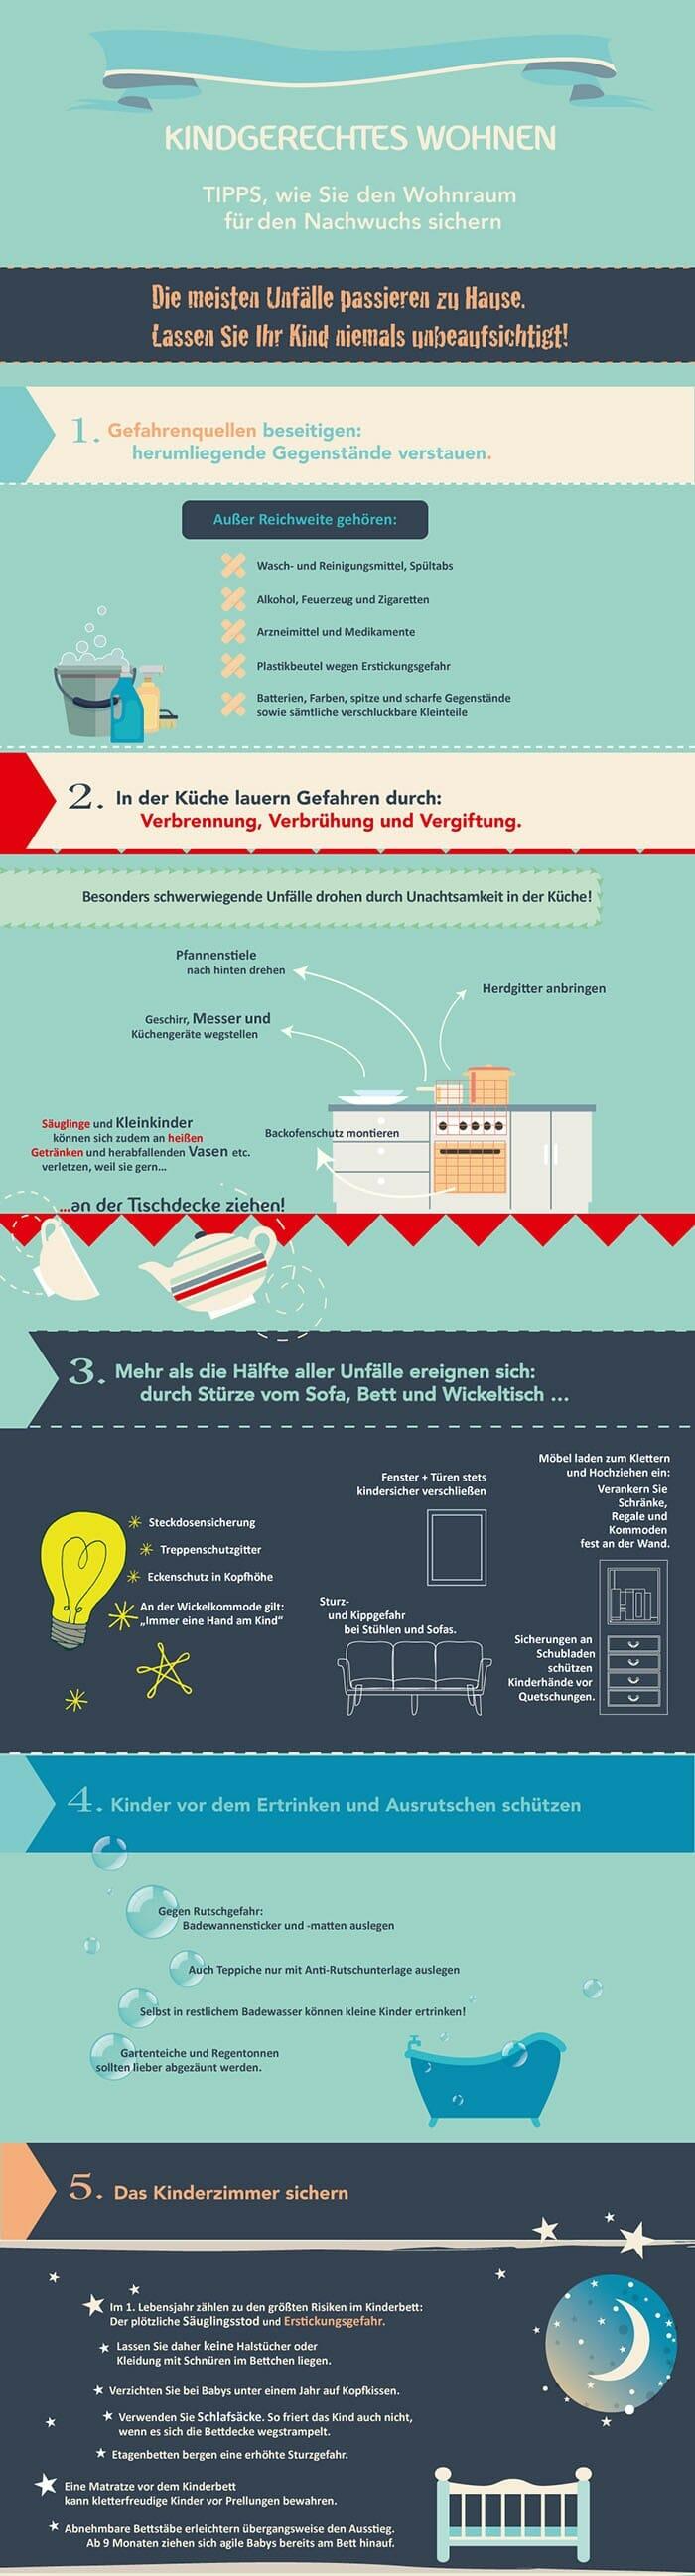 Infografik kindgerechtes Wohnen